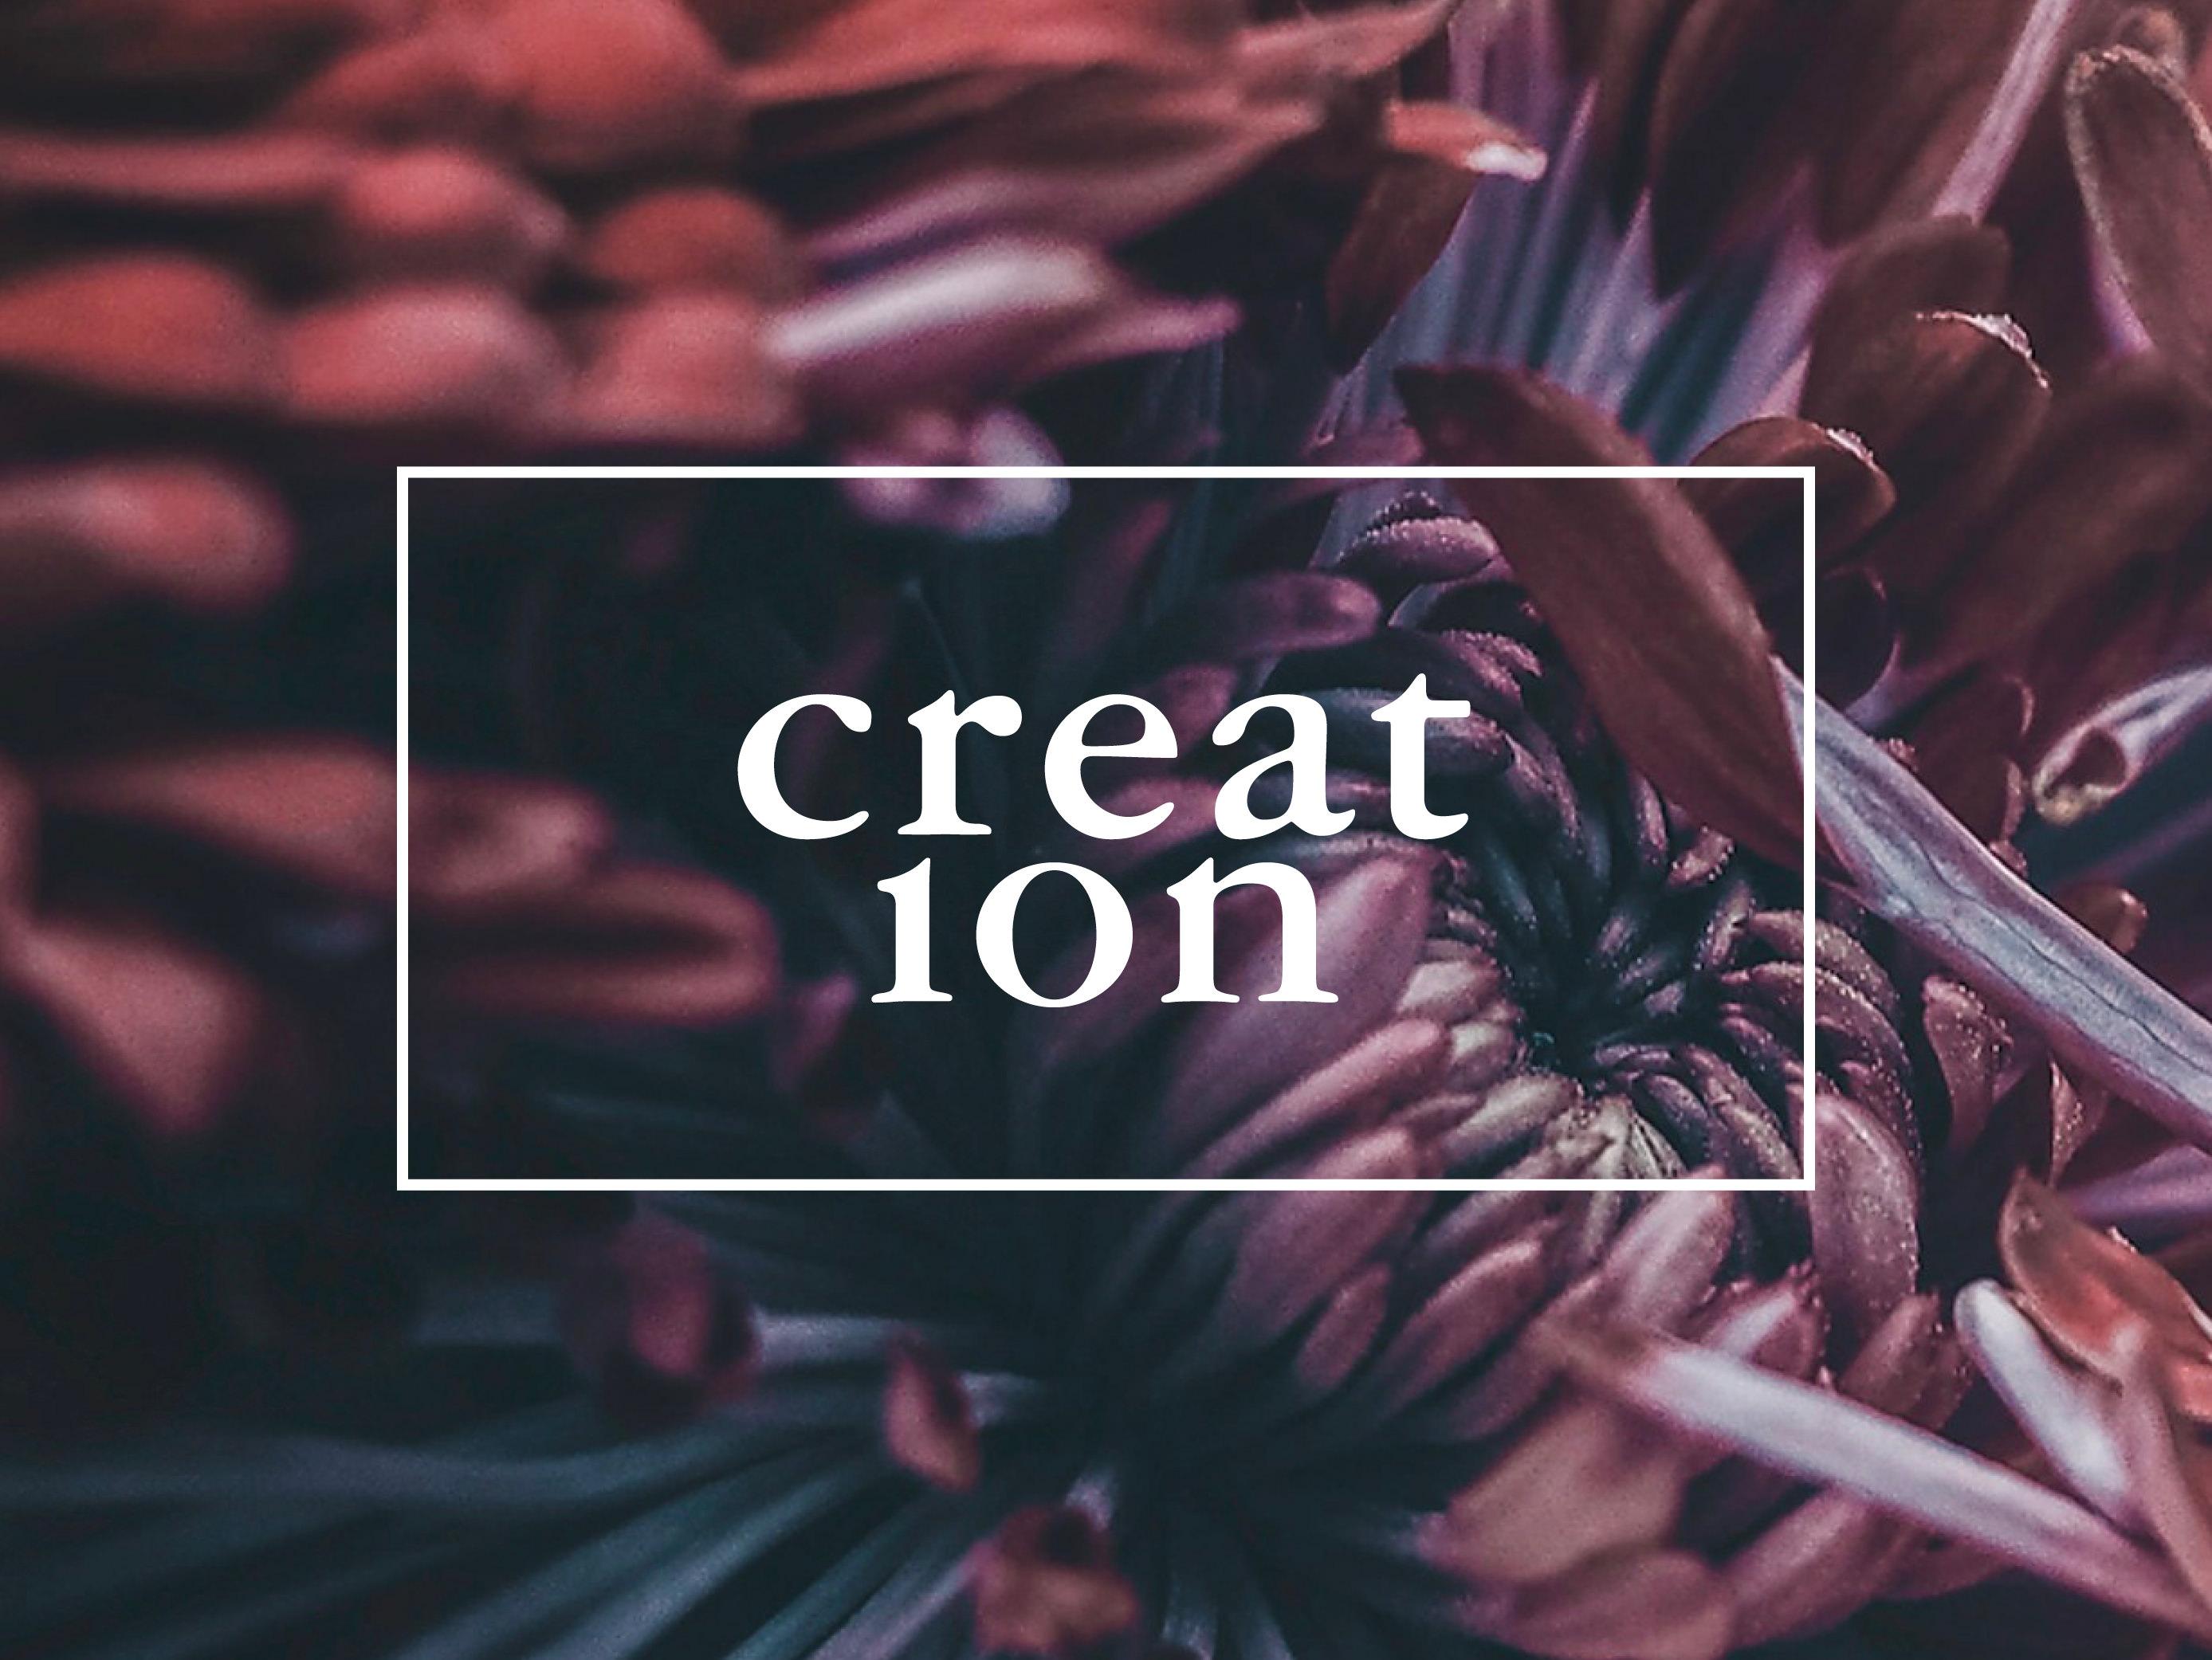 GDGB Creation